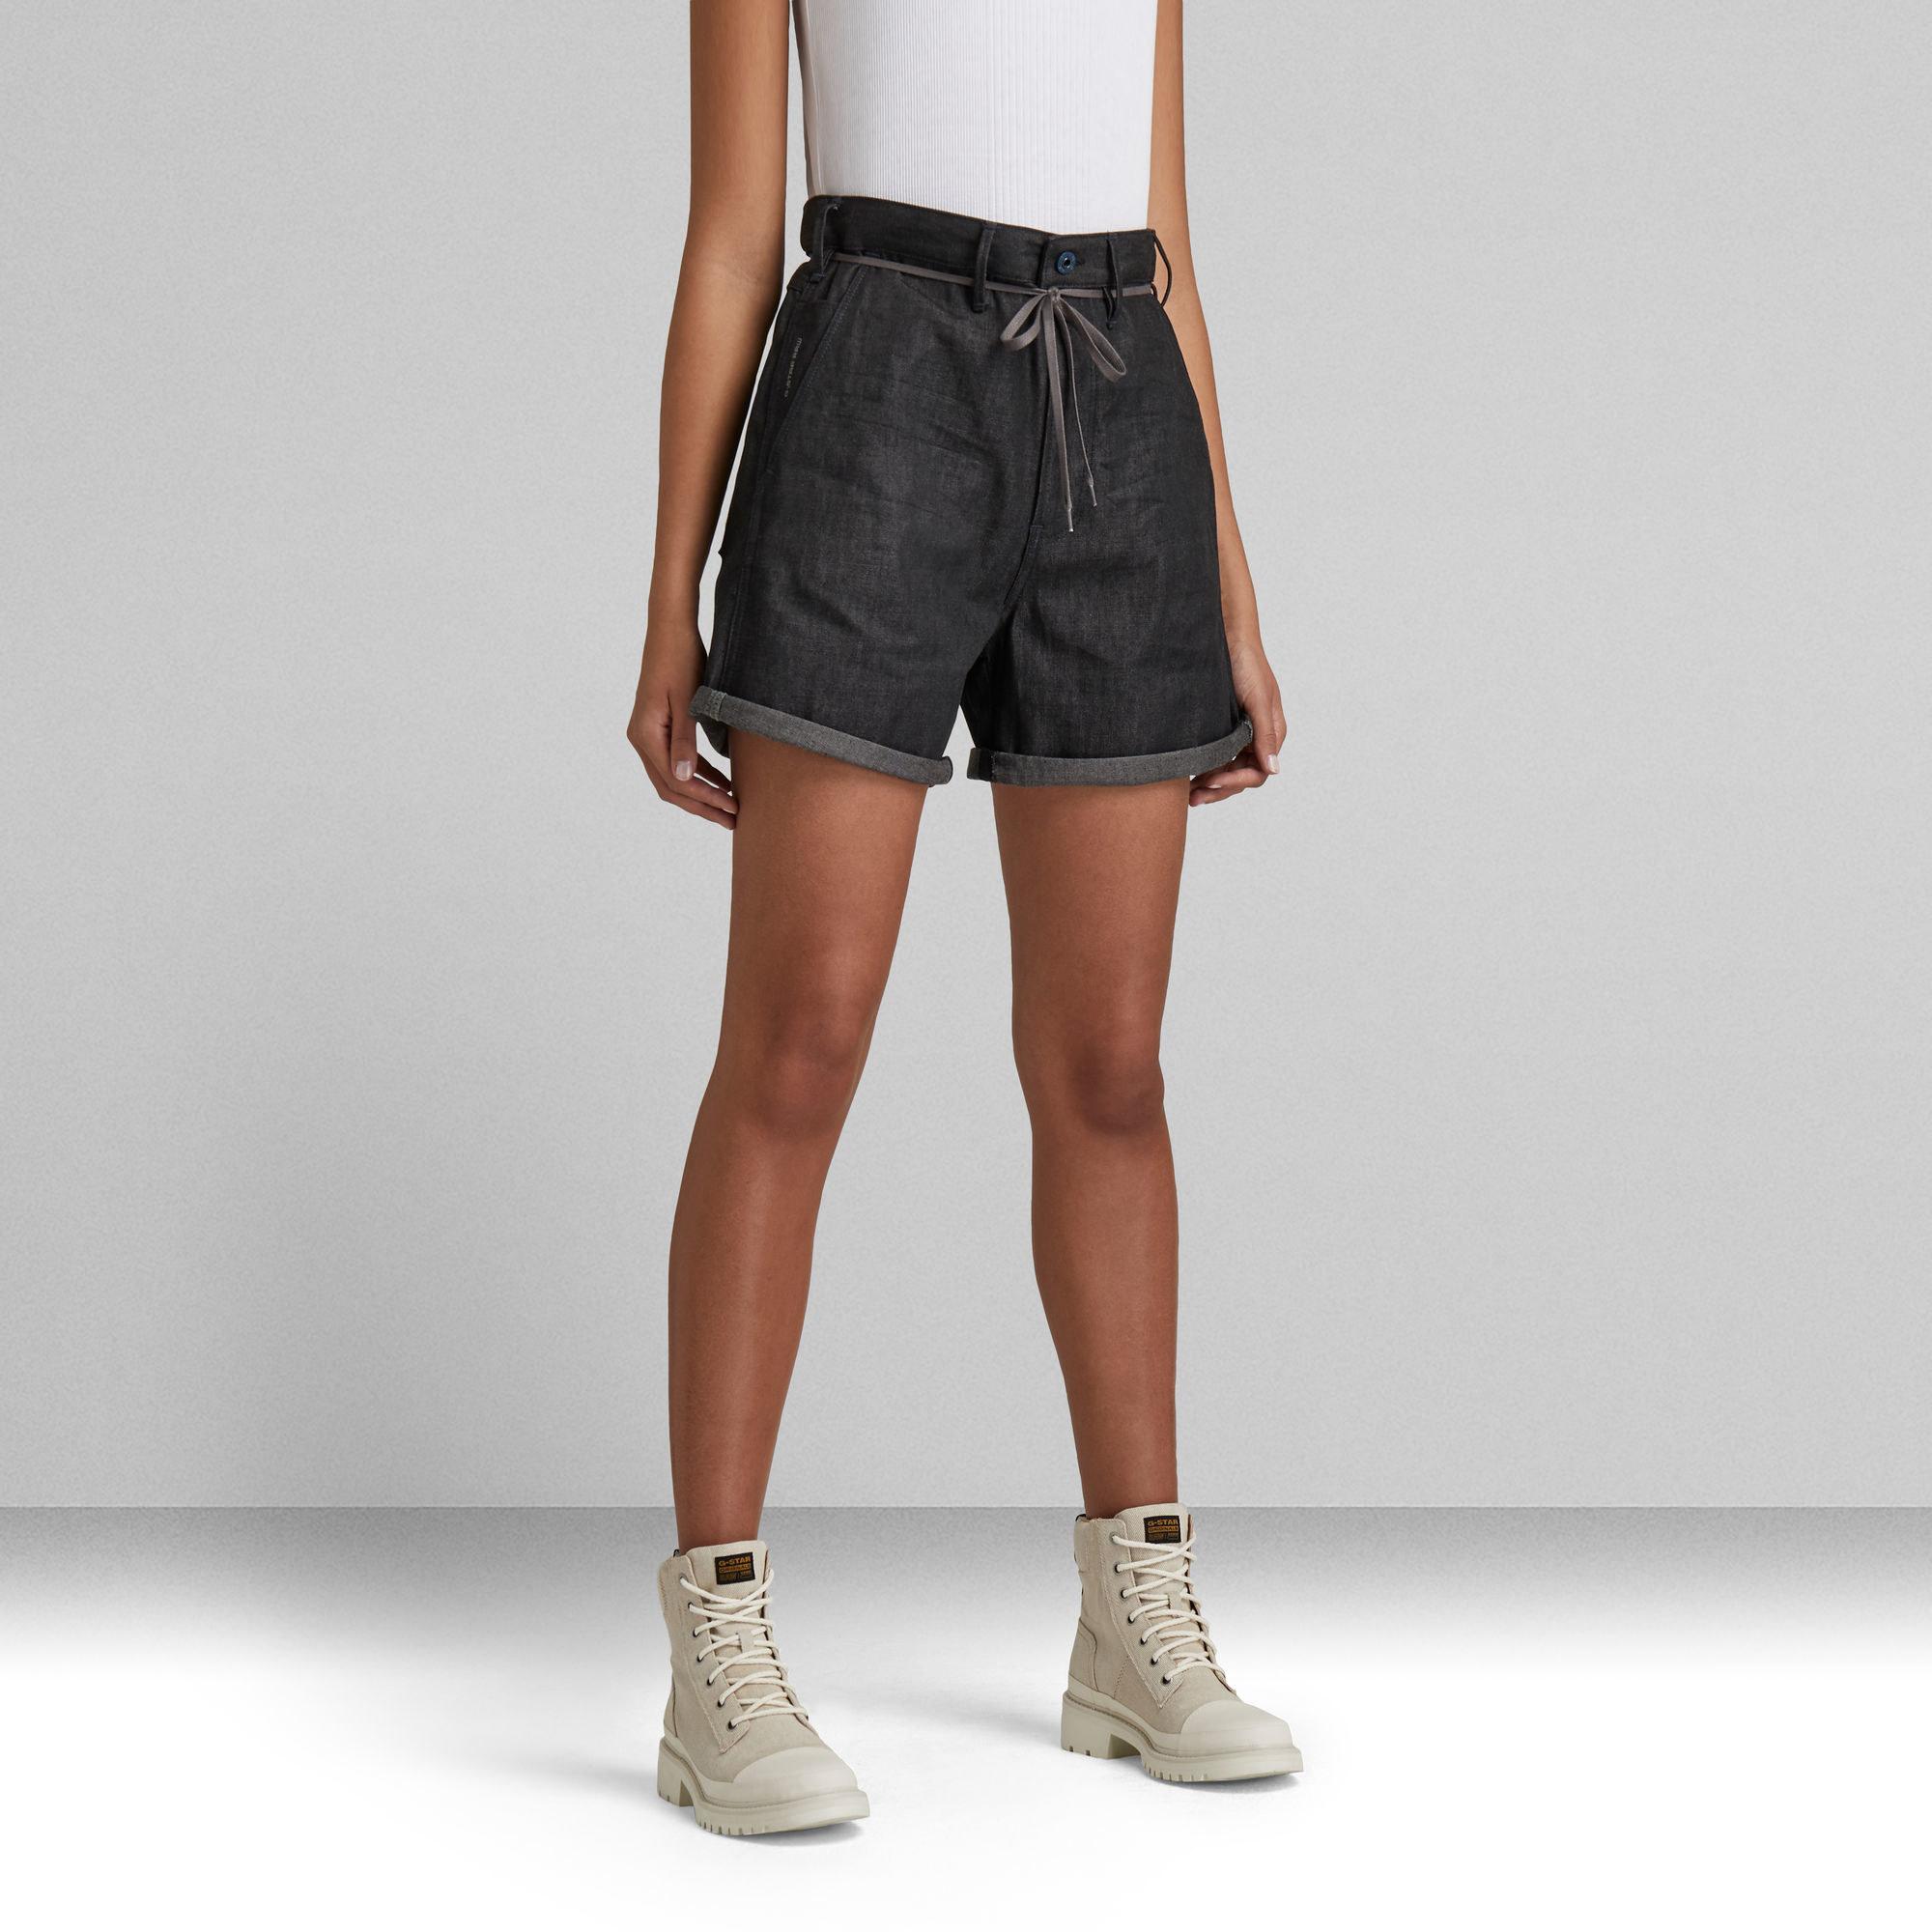 A model wears the shorts in dark indigo